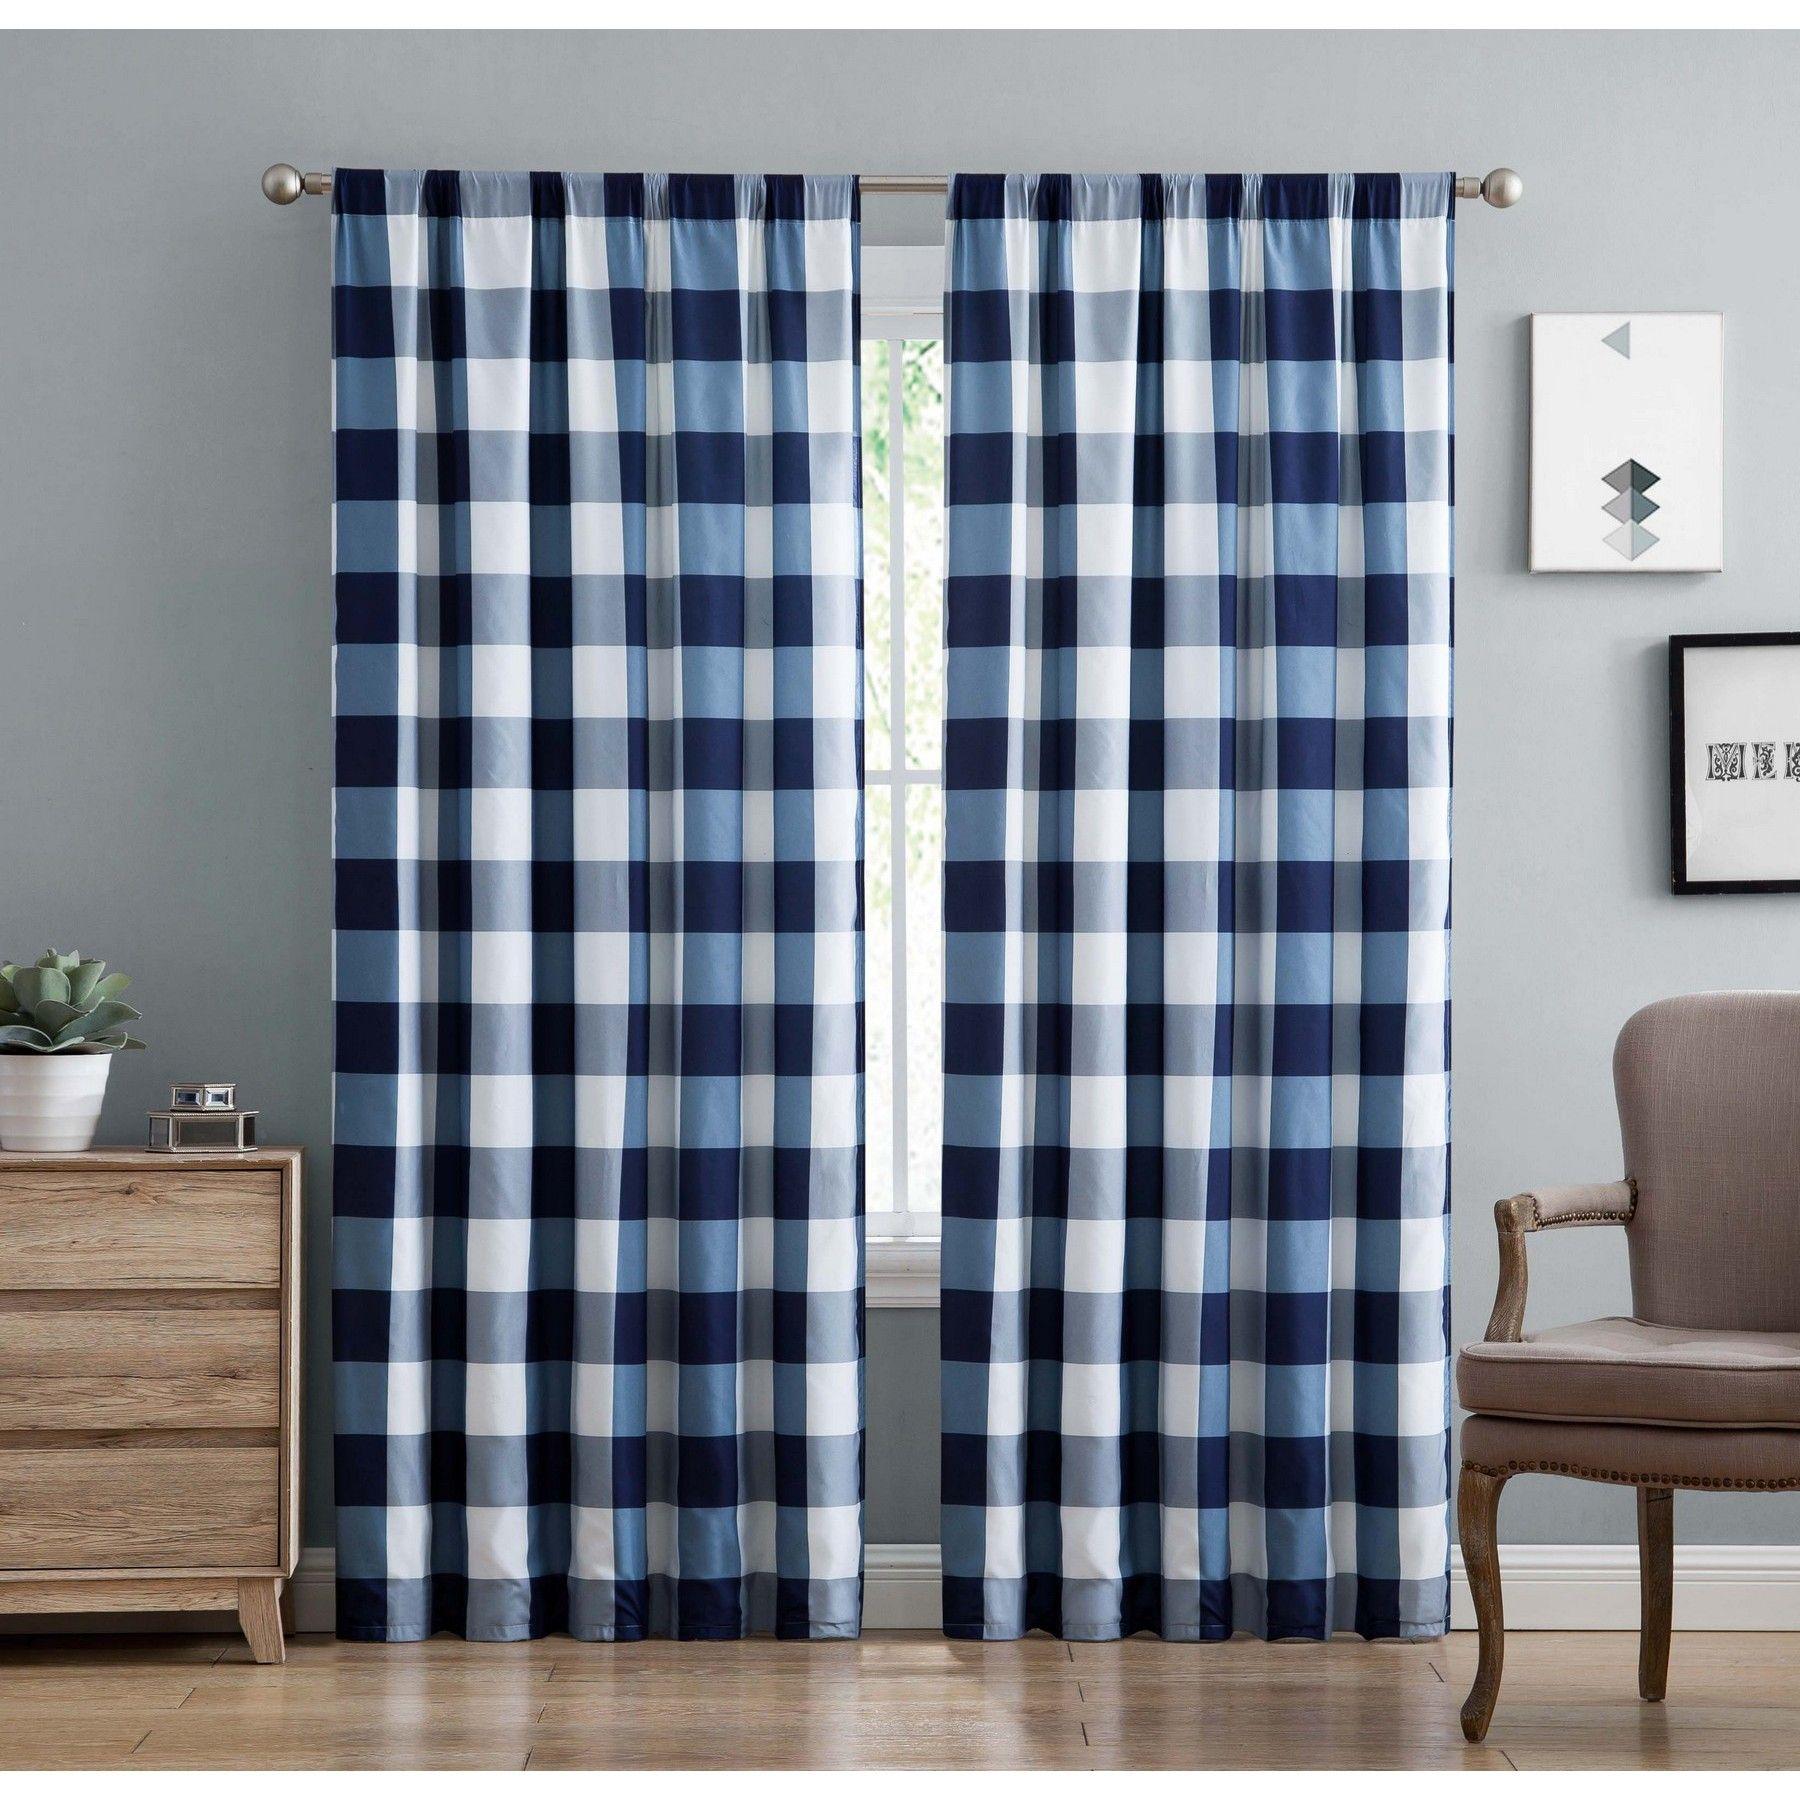 Truly Soft Everyday Buffalo Plaid Gray Drape Set Walmart Com In 2020 Panel Curtains Plaid Curtains Curtain Decor